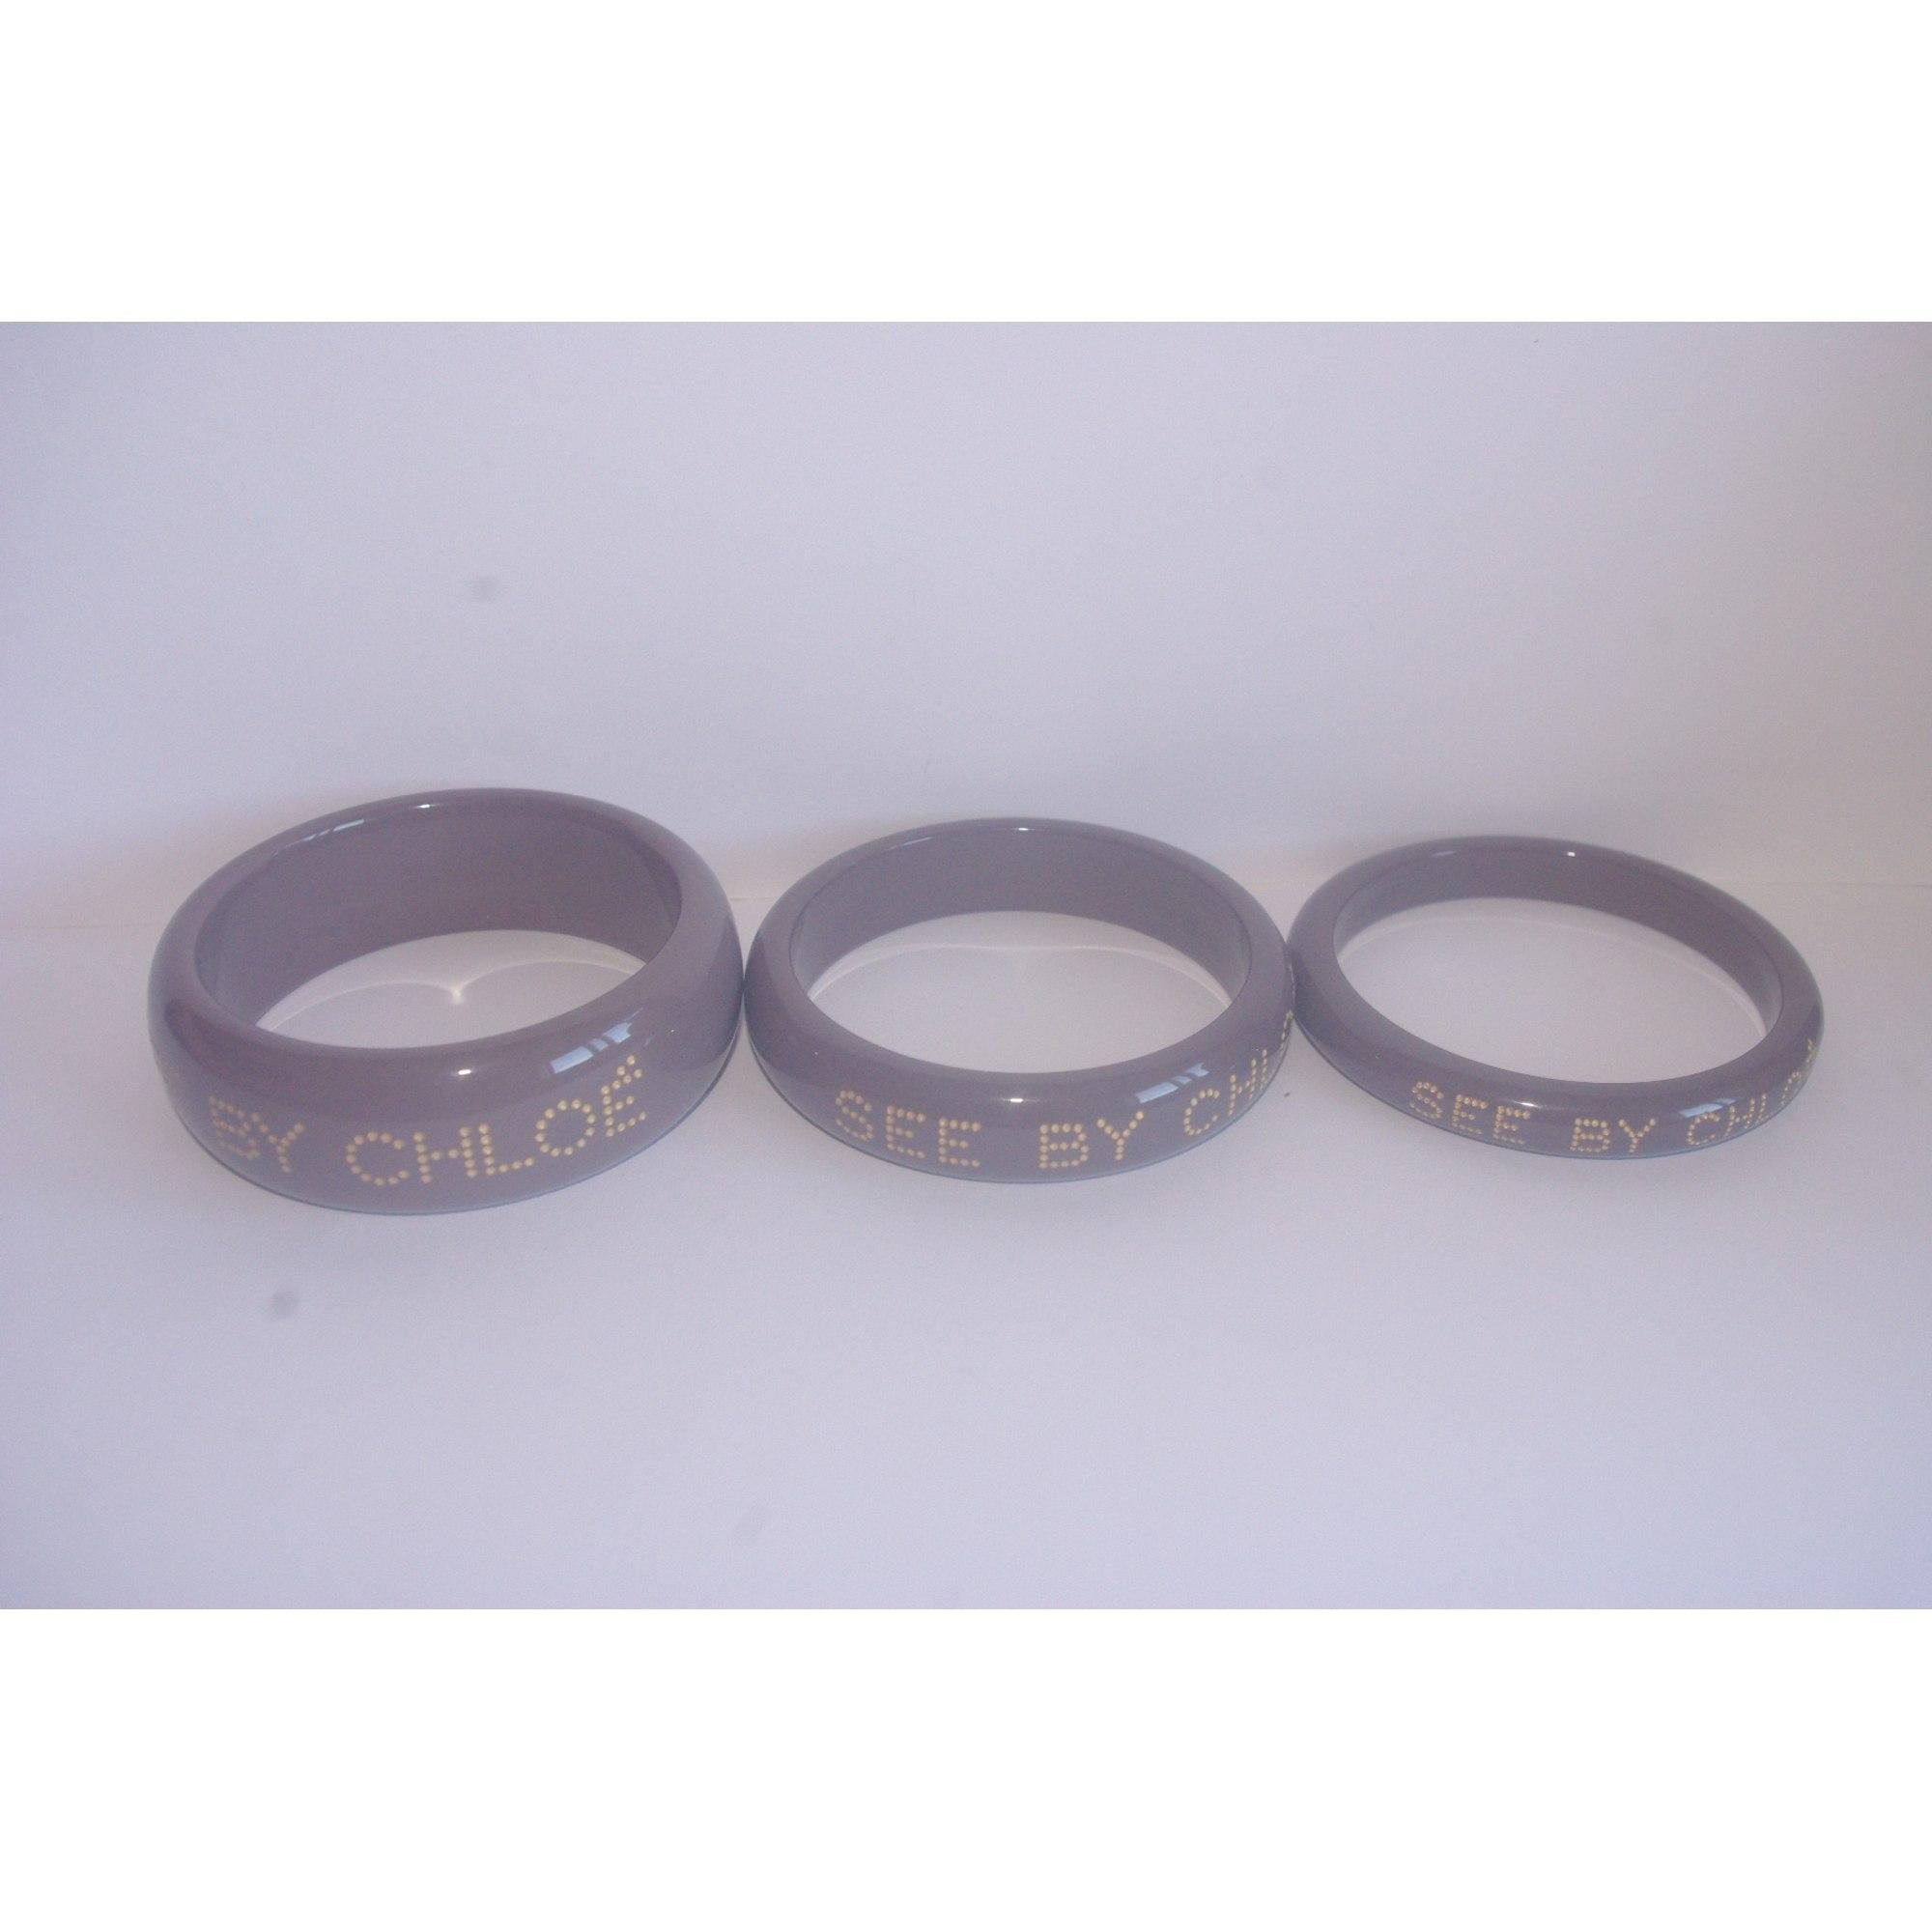 Bracelet SEE BY CHLOE plastique gris